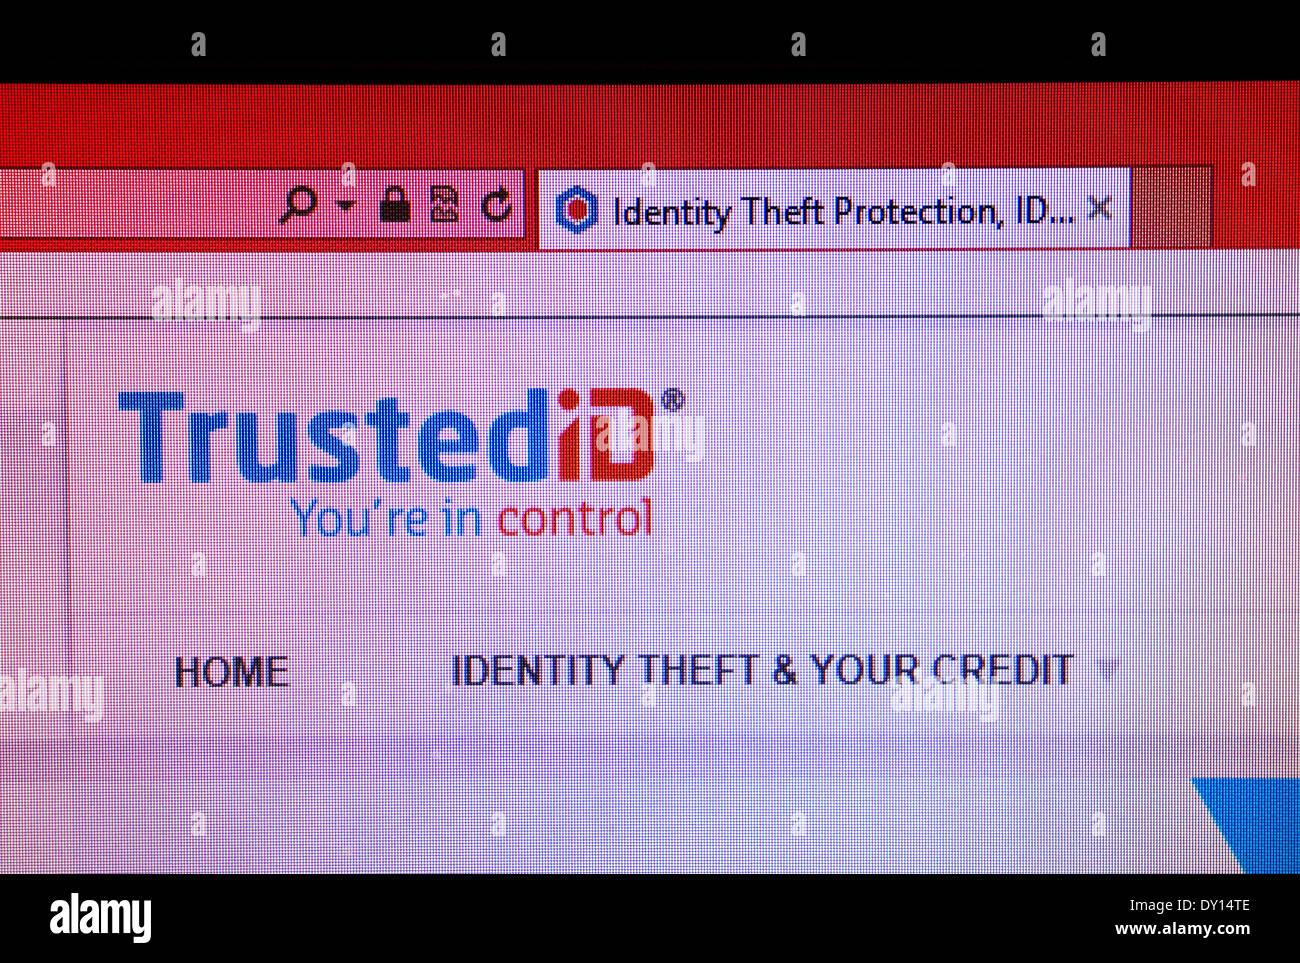 TrustediD identity theft website Stock Photo